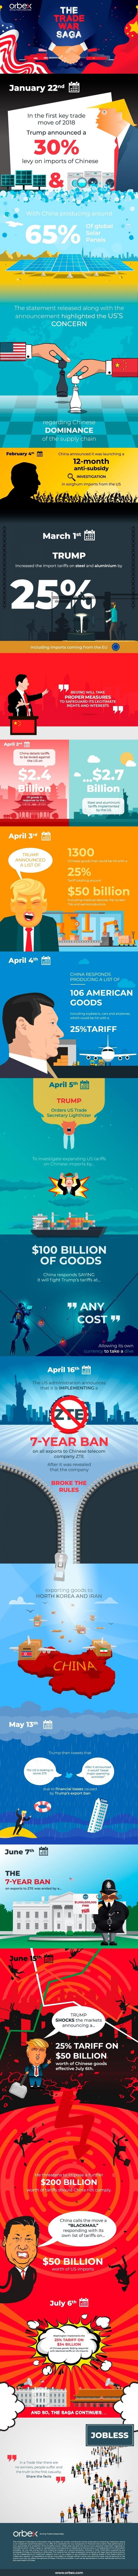 The Trade War Saga #infographic